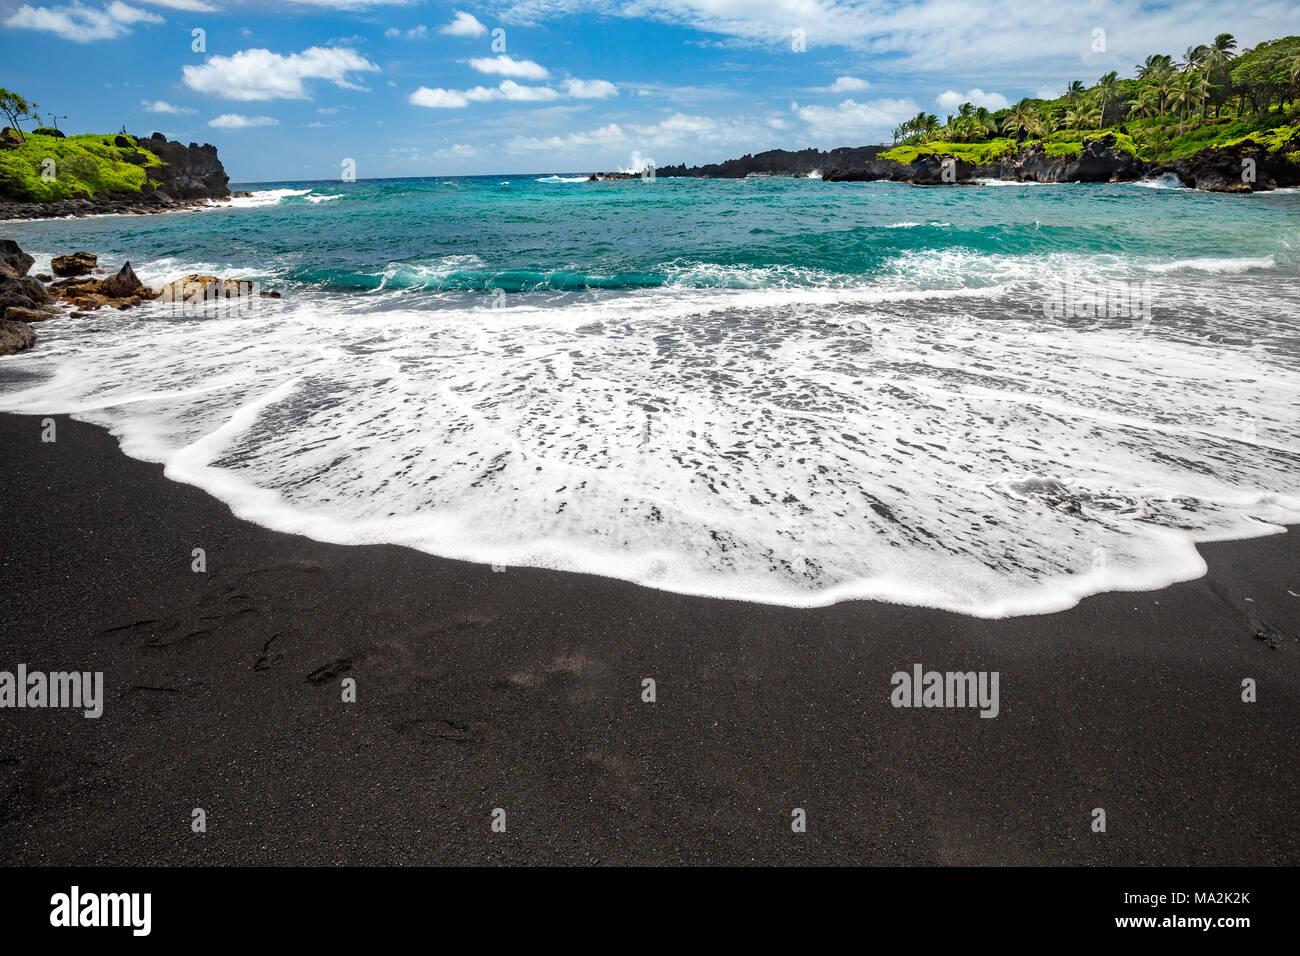 Der schwarze Sandstrand im Waianapanapa State Park, Hana, Maui, Hawaii. Stockbild